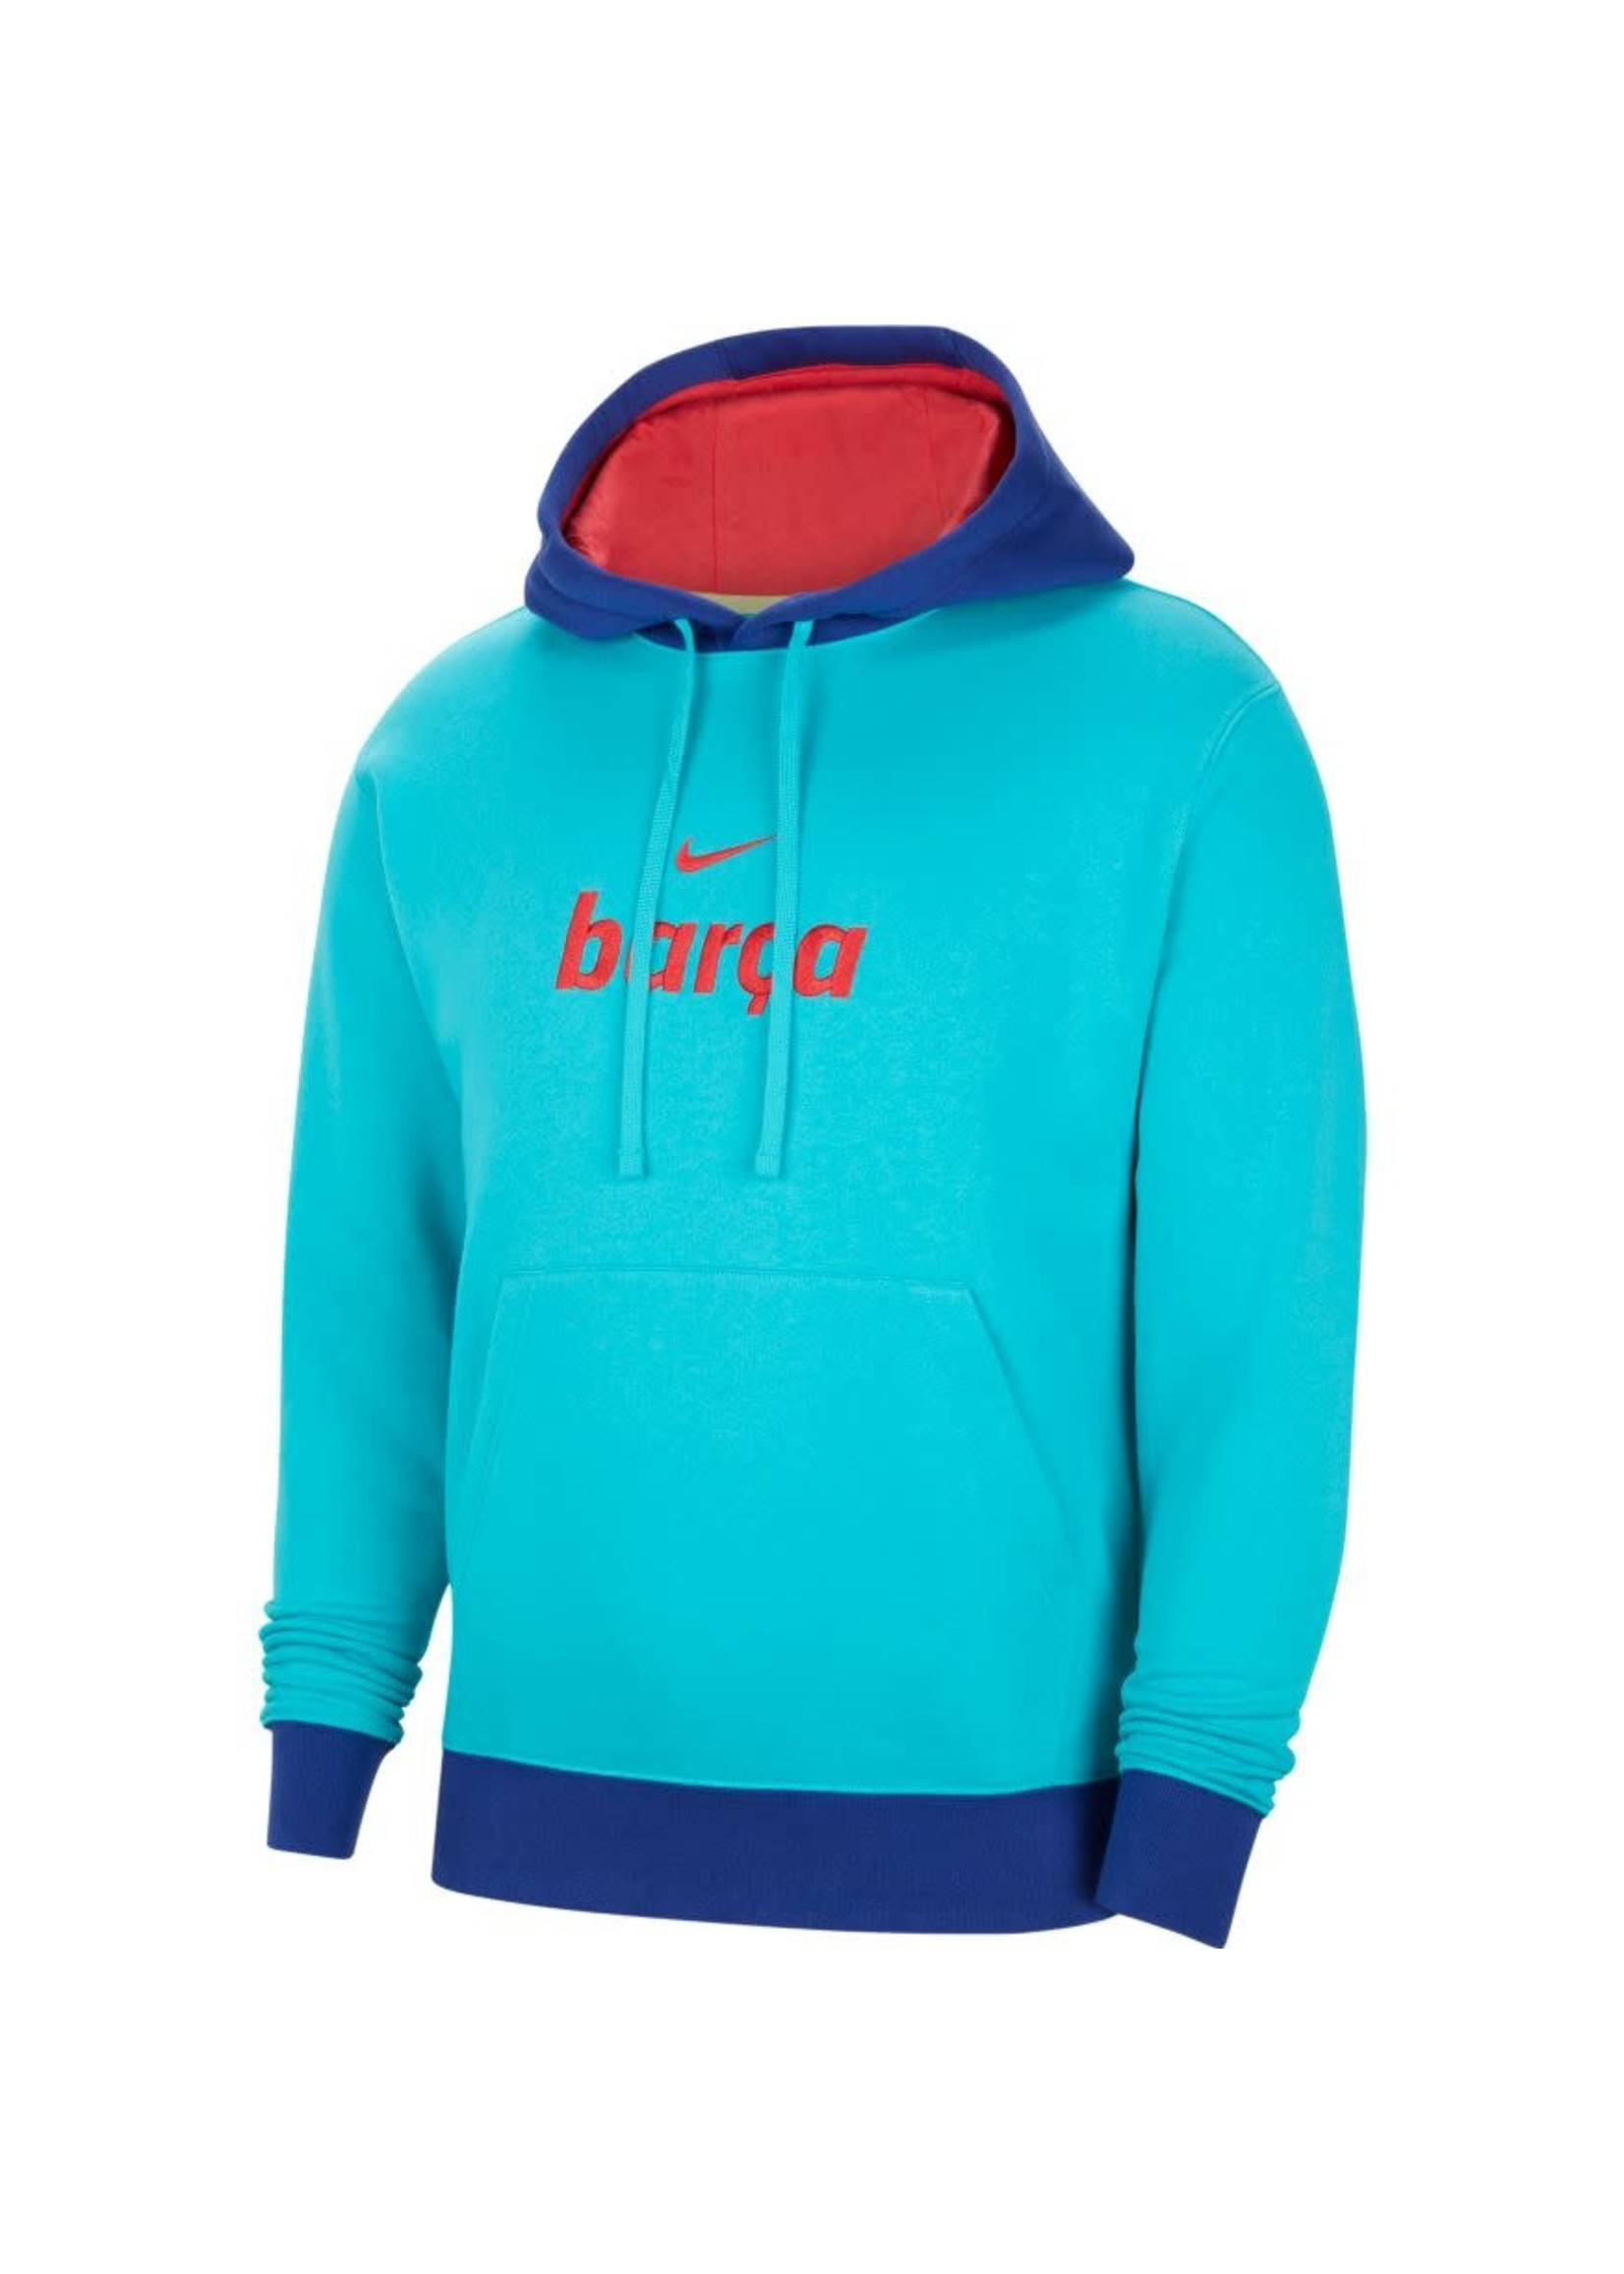 Nike Barcelona Fleece Pullover Hoodie - Blue